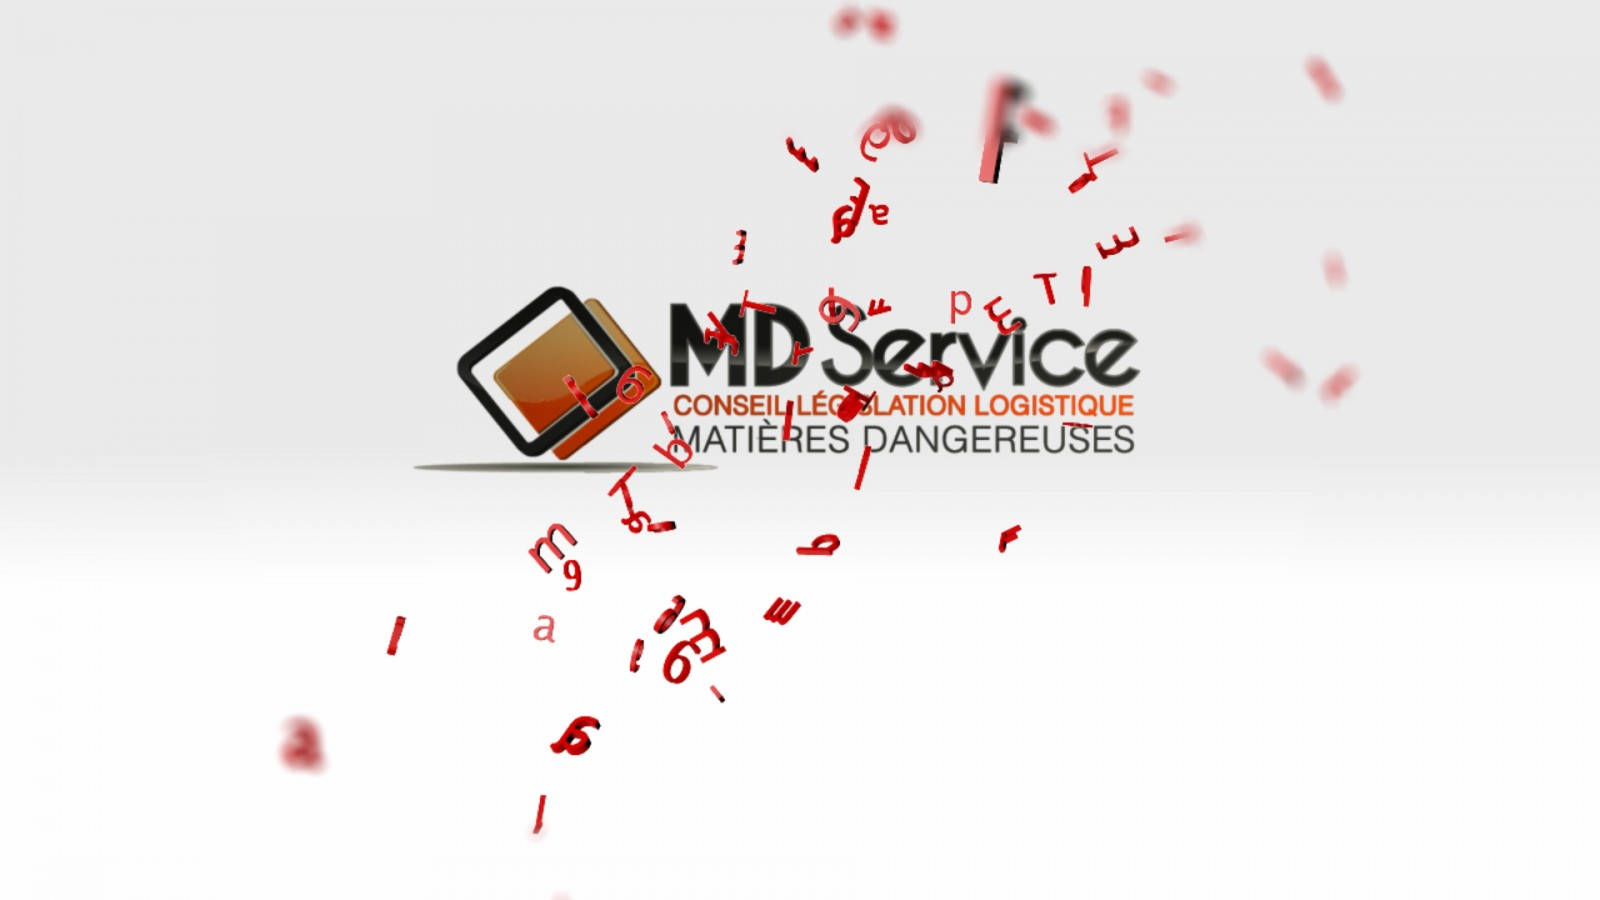 MD service7